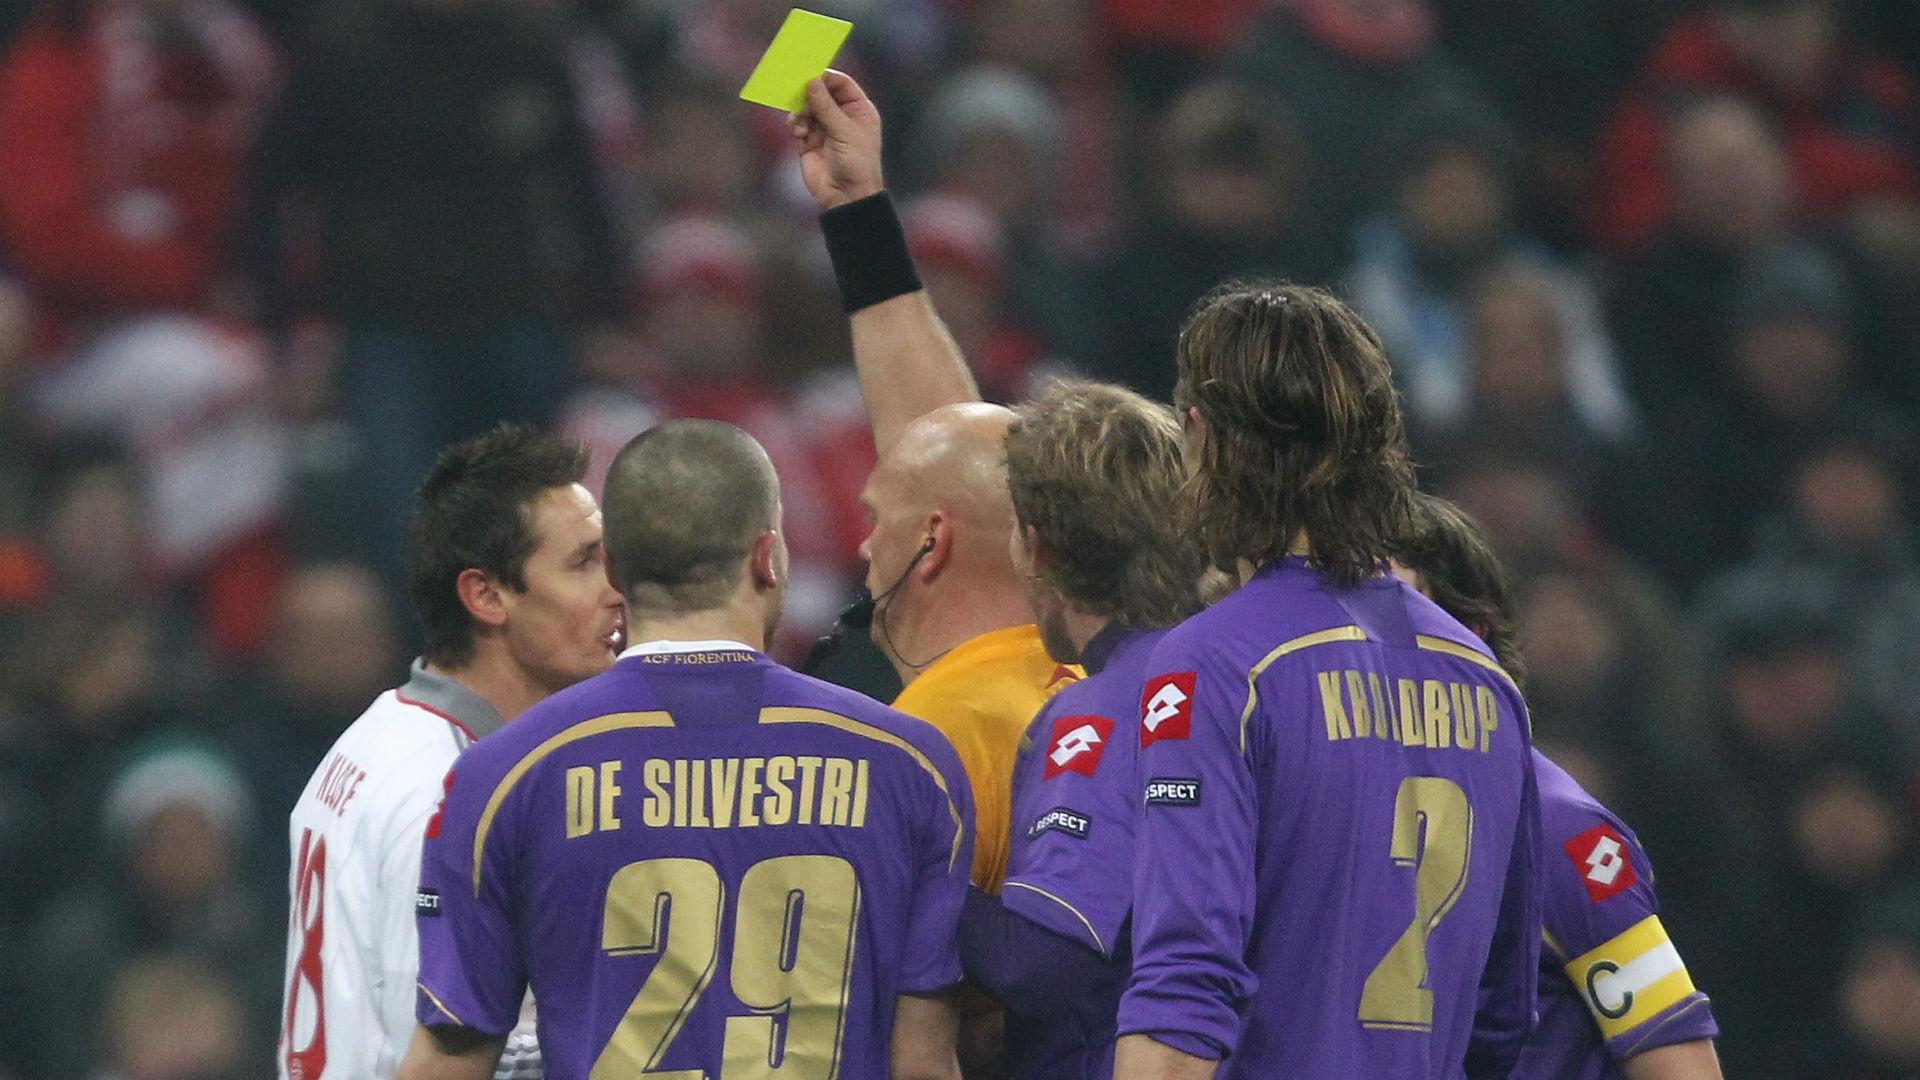 Tom Henning Ovrebro Bayern Fiorentina